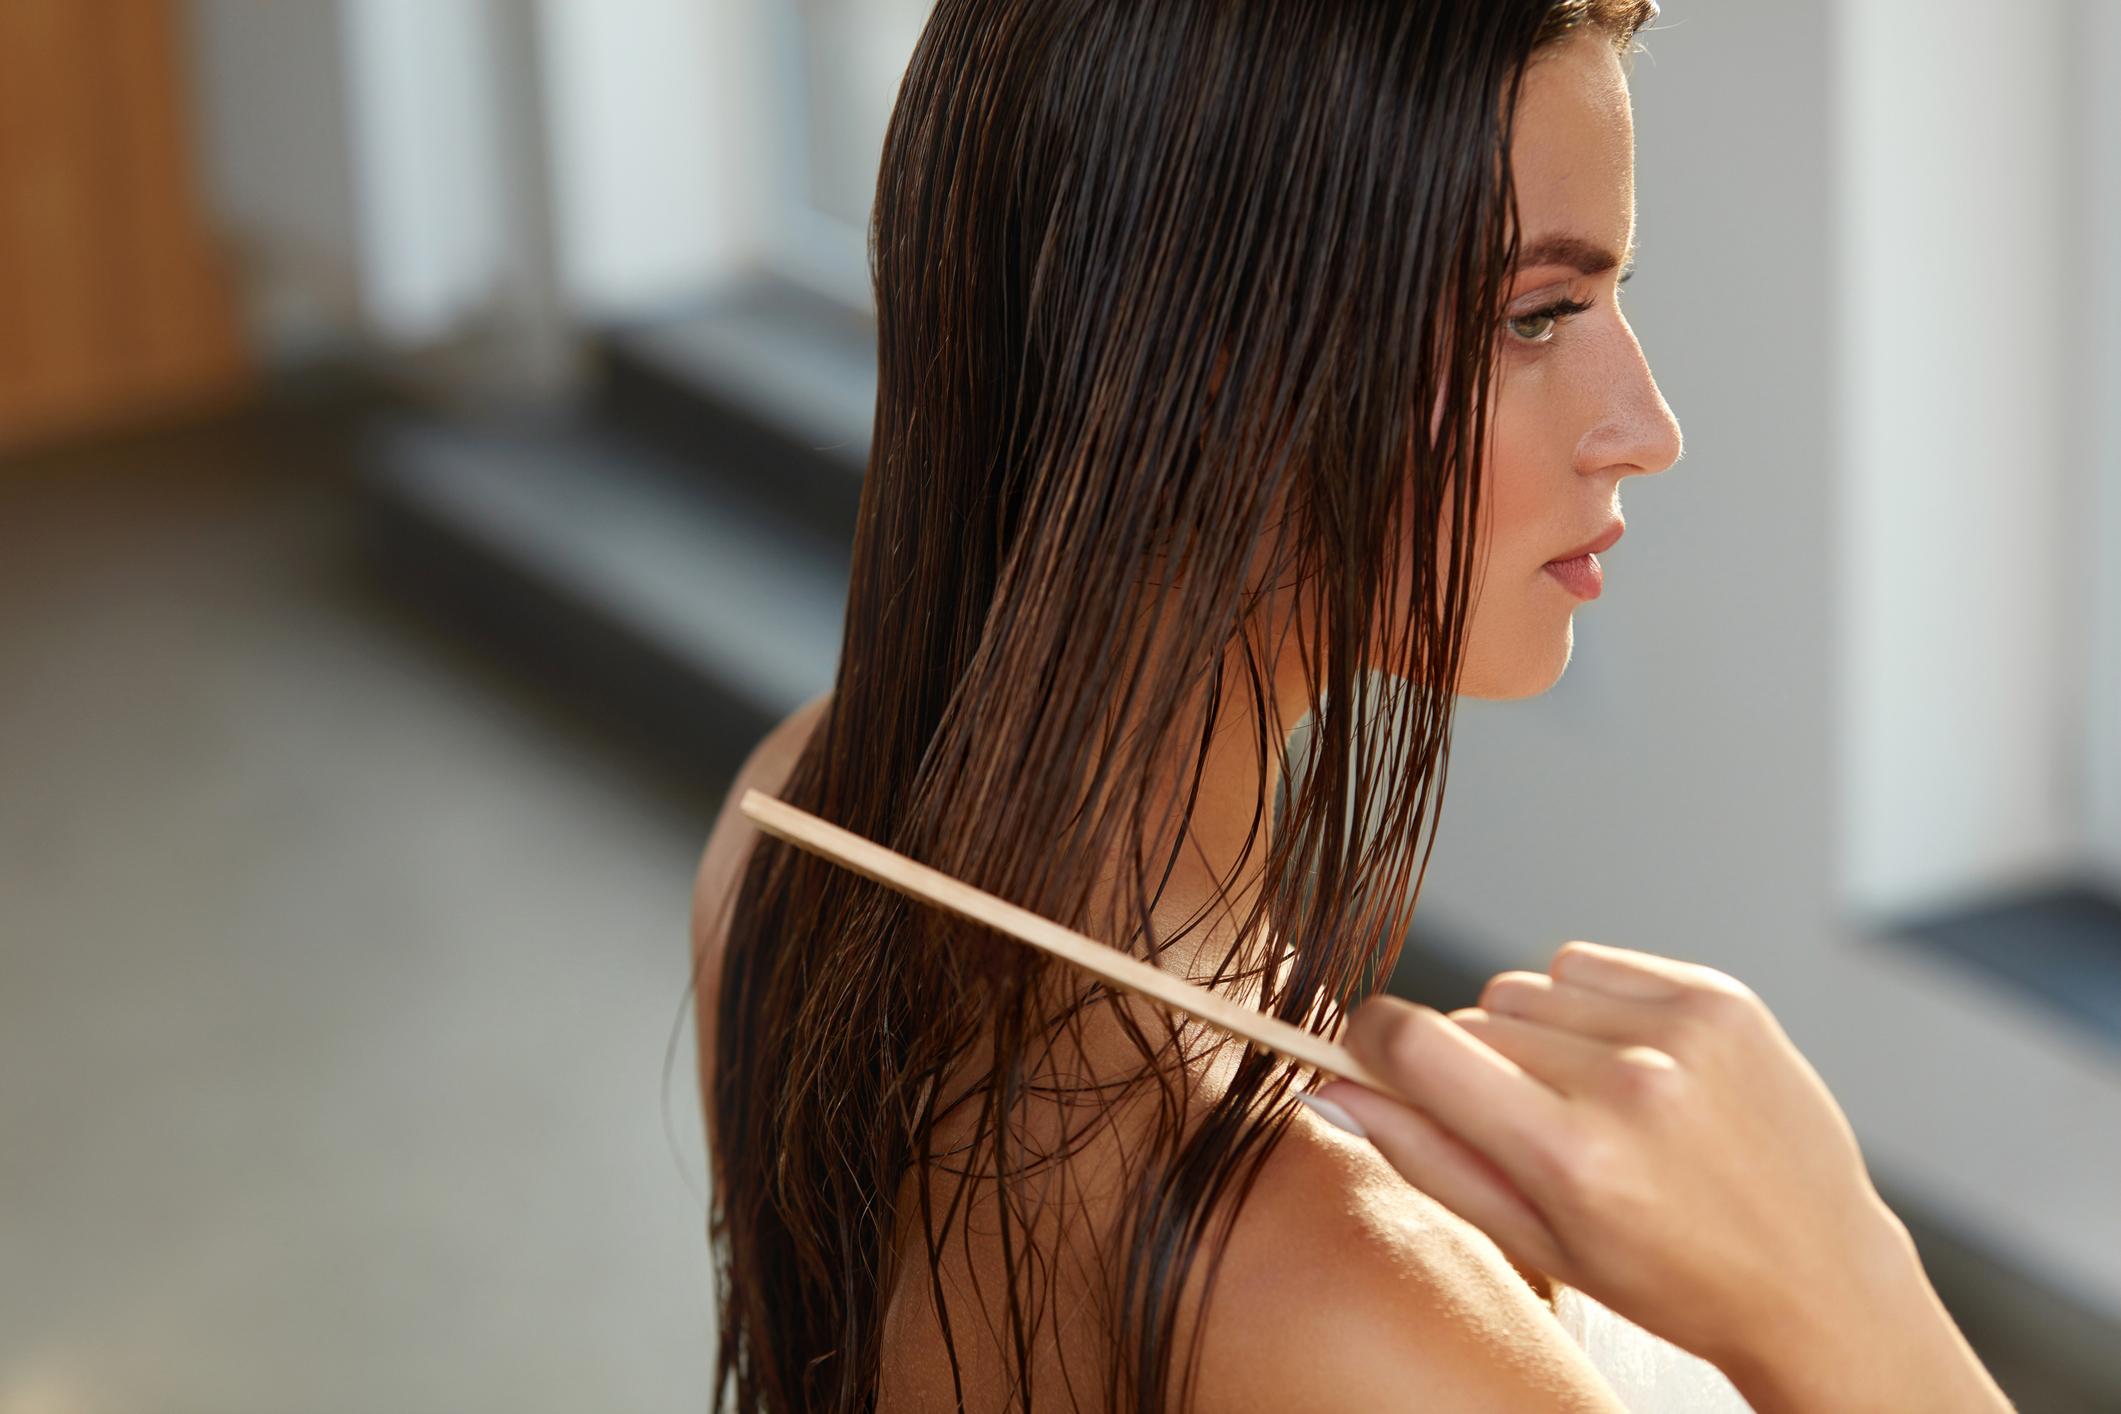 la-manera-correcta-de-lavar-el-pelo.jpg